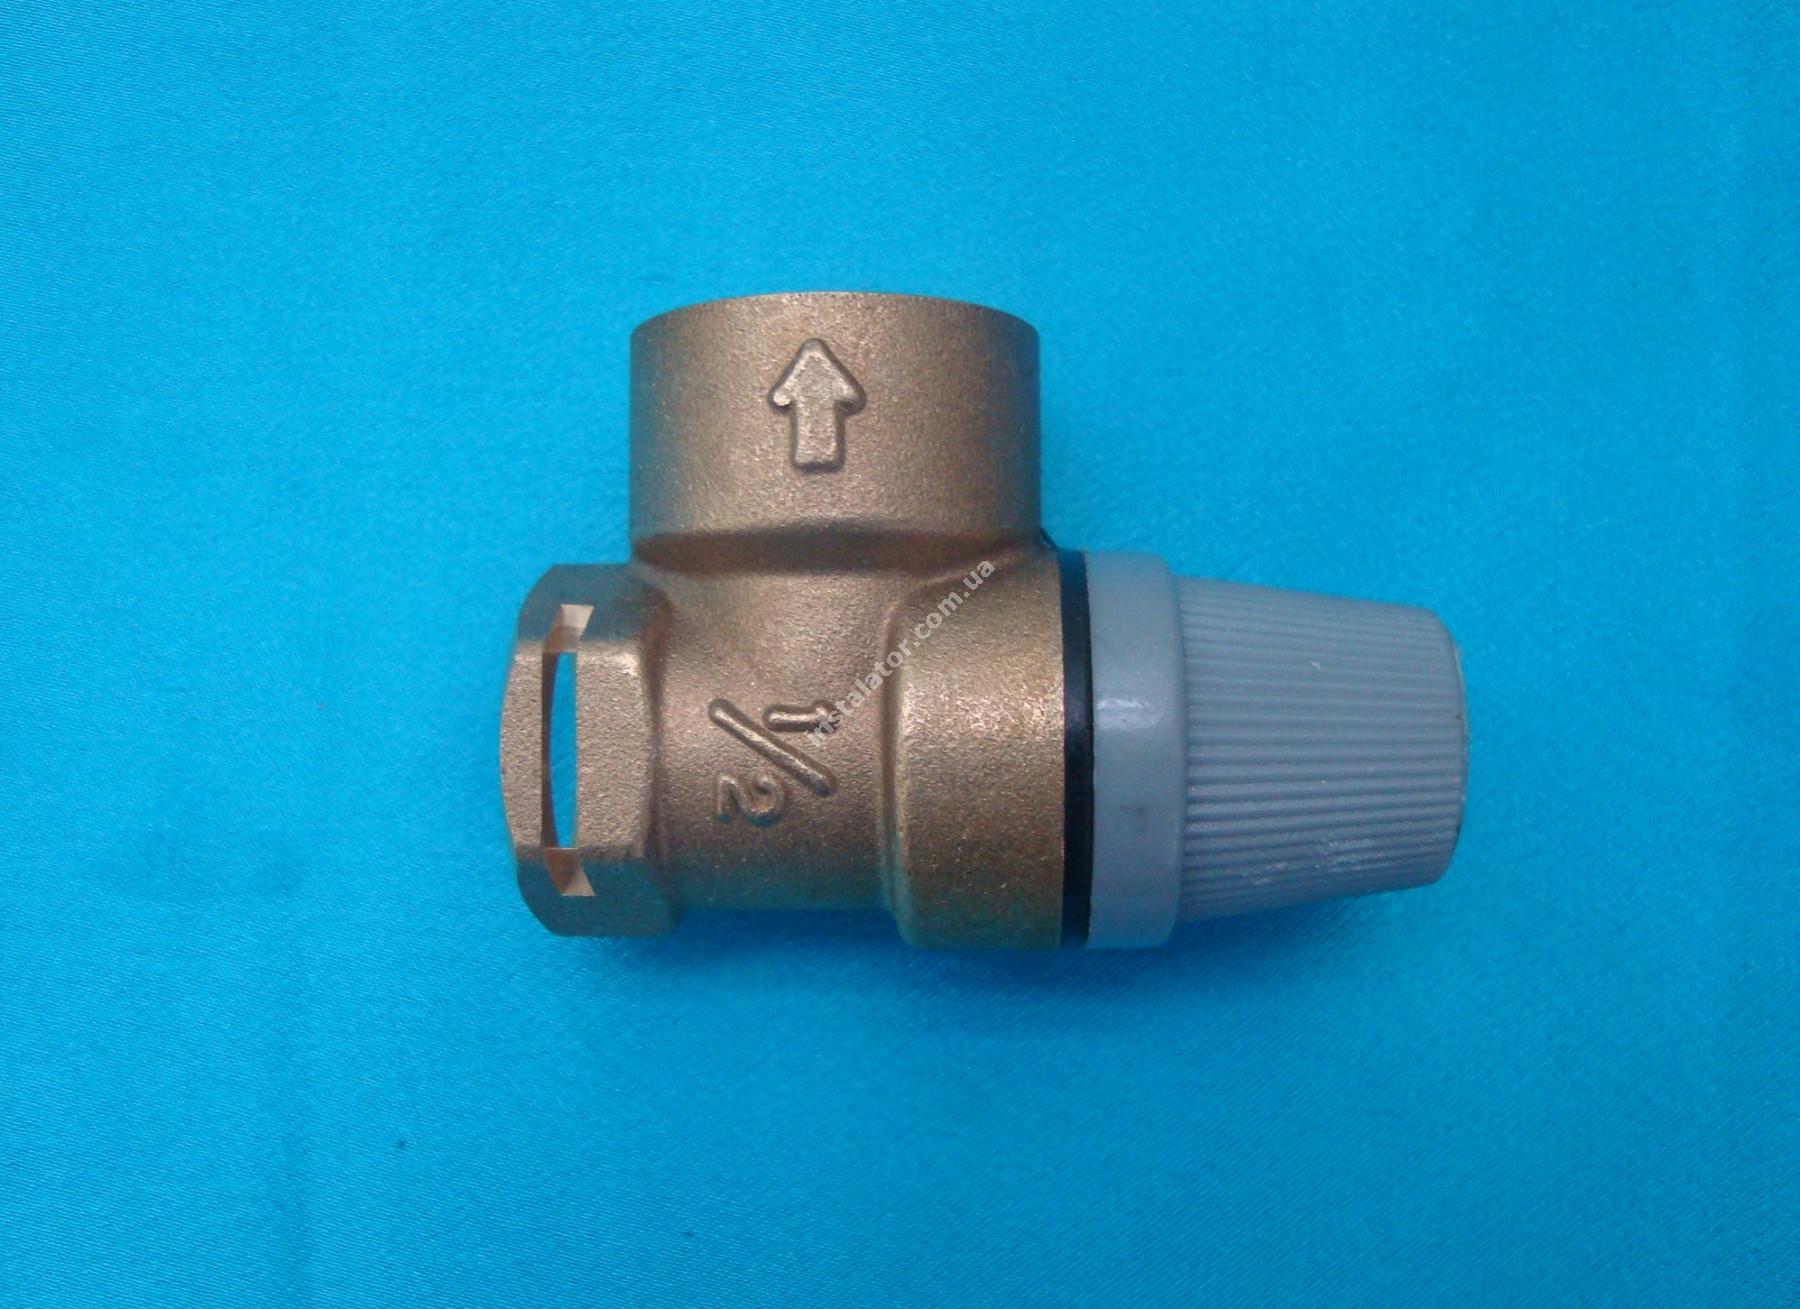 190732 (аналог) Запобіжний клапан  VAILLANT Pro/Plus 3 bar full-image-3